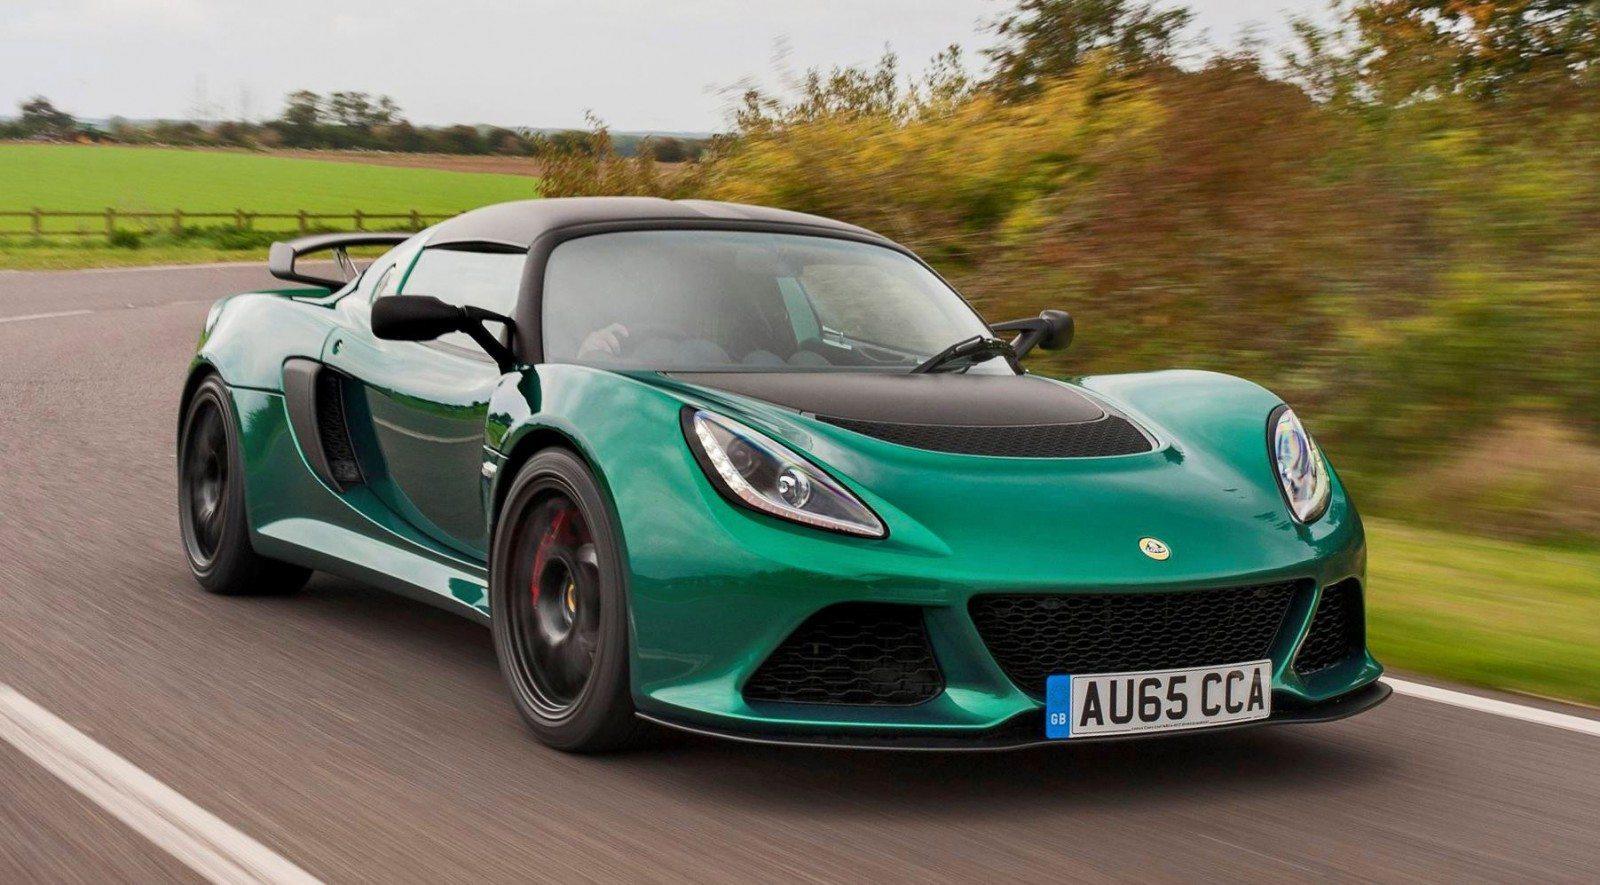 Lotus Elise 0 60 >> 3.7s, 170MPH 2016 Lotus EXIGE SPORT 350 is New Road-Legal Cup Racer » Car-Revs-Daily.com